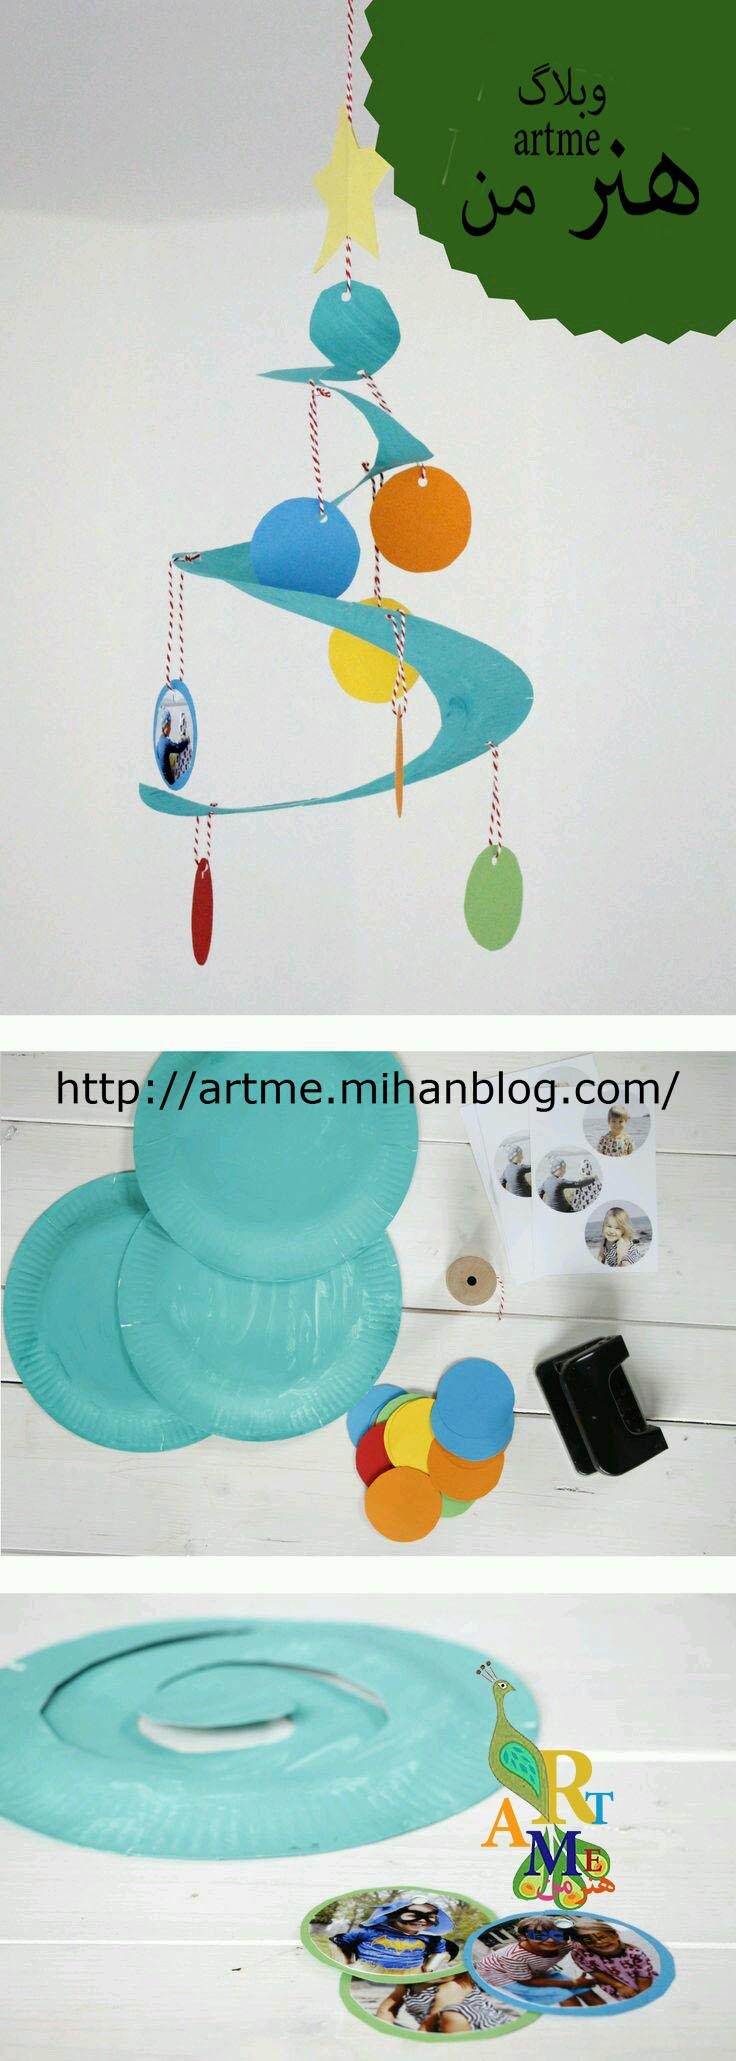 http://s9.picofile.com/file/8312249992/f24469eb543359d40333076b577bcfdc.jpg